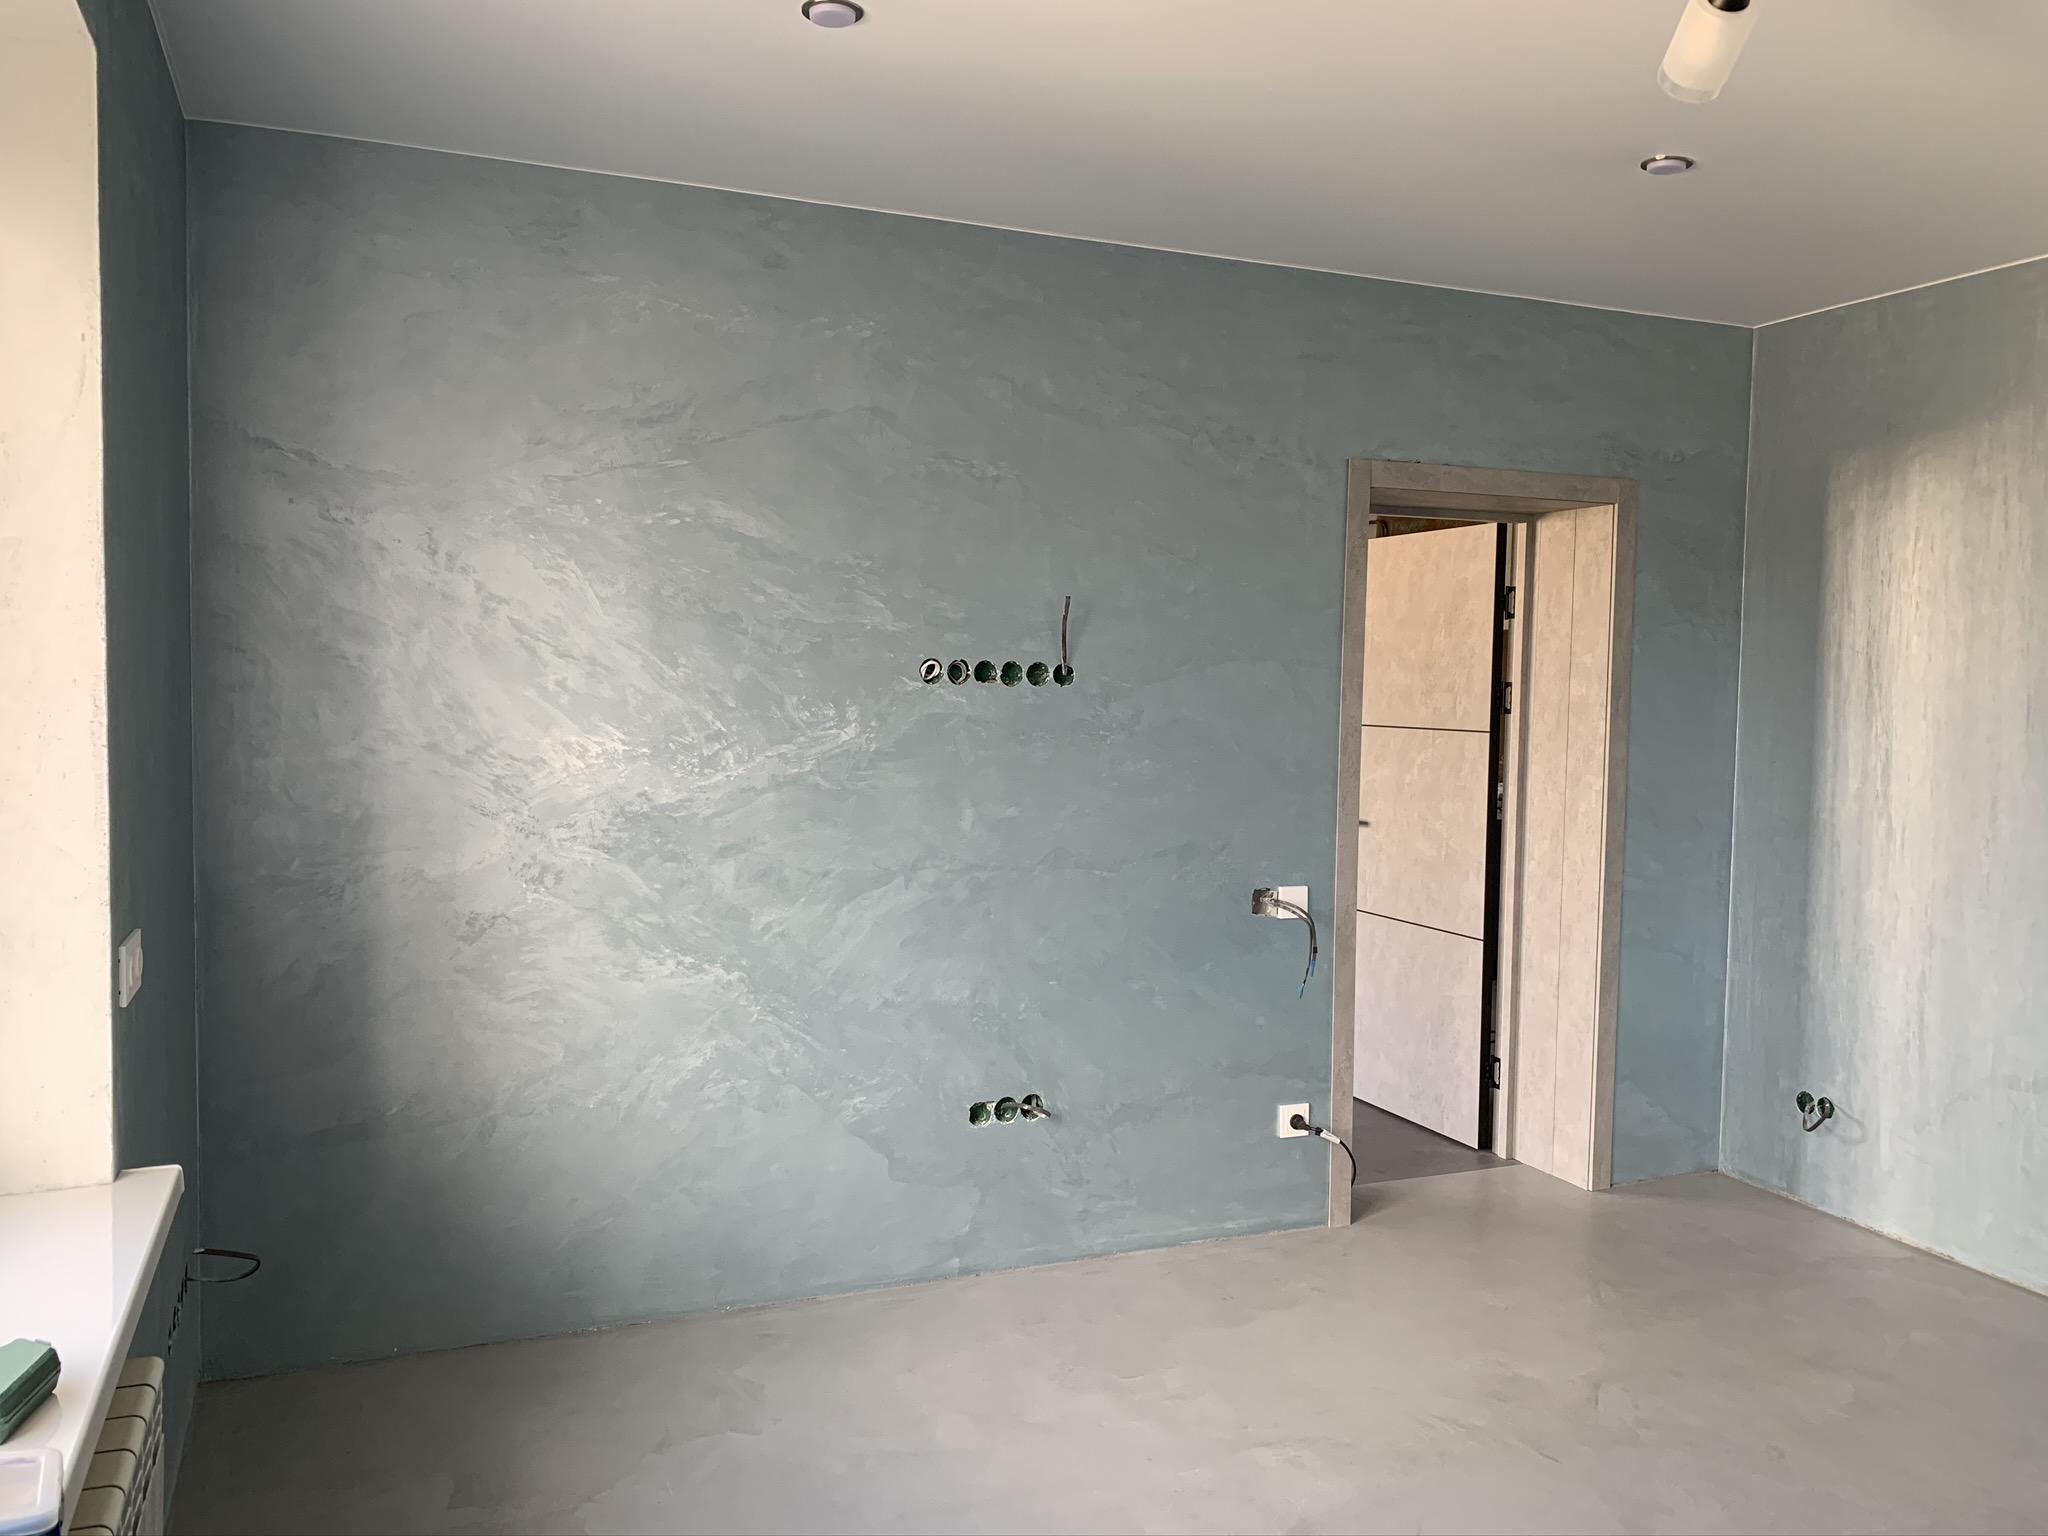 Проект 02/2021, квартира Новороссийск. Спальня 1 -  Rivedil DecorFondo + Persia